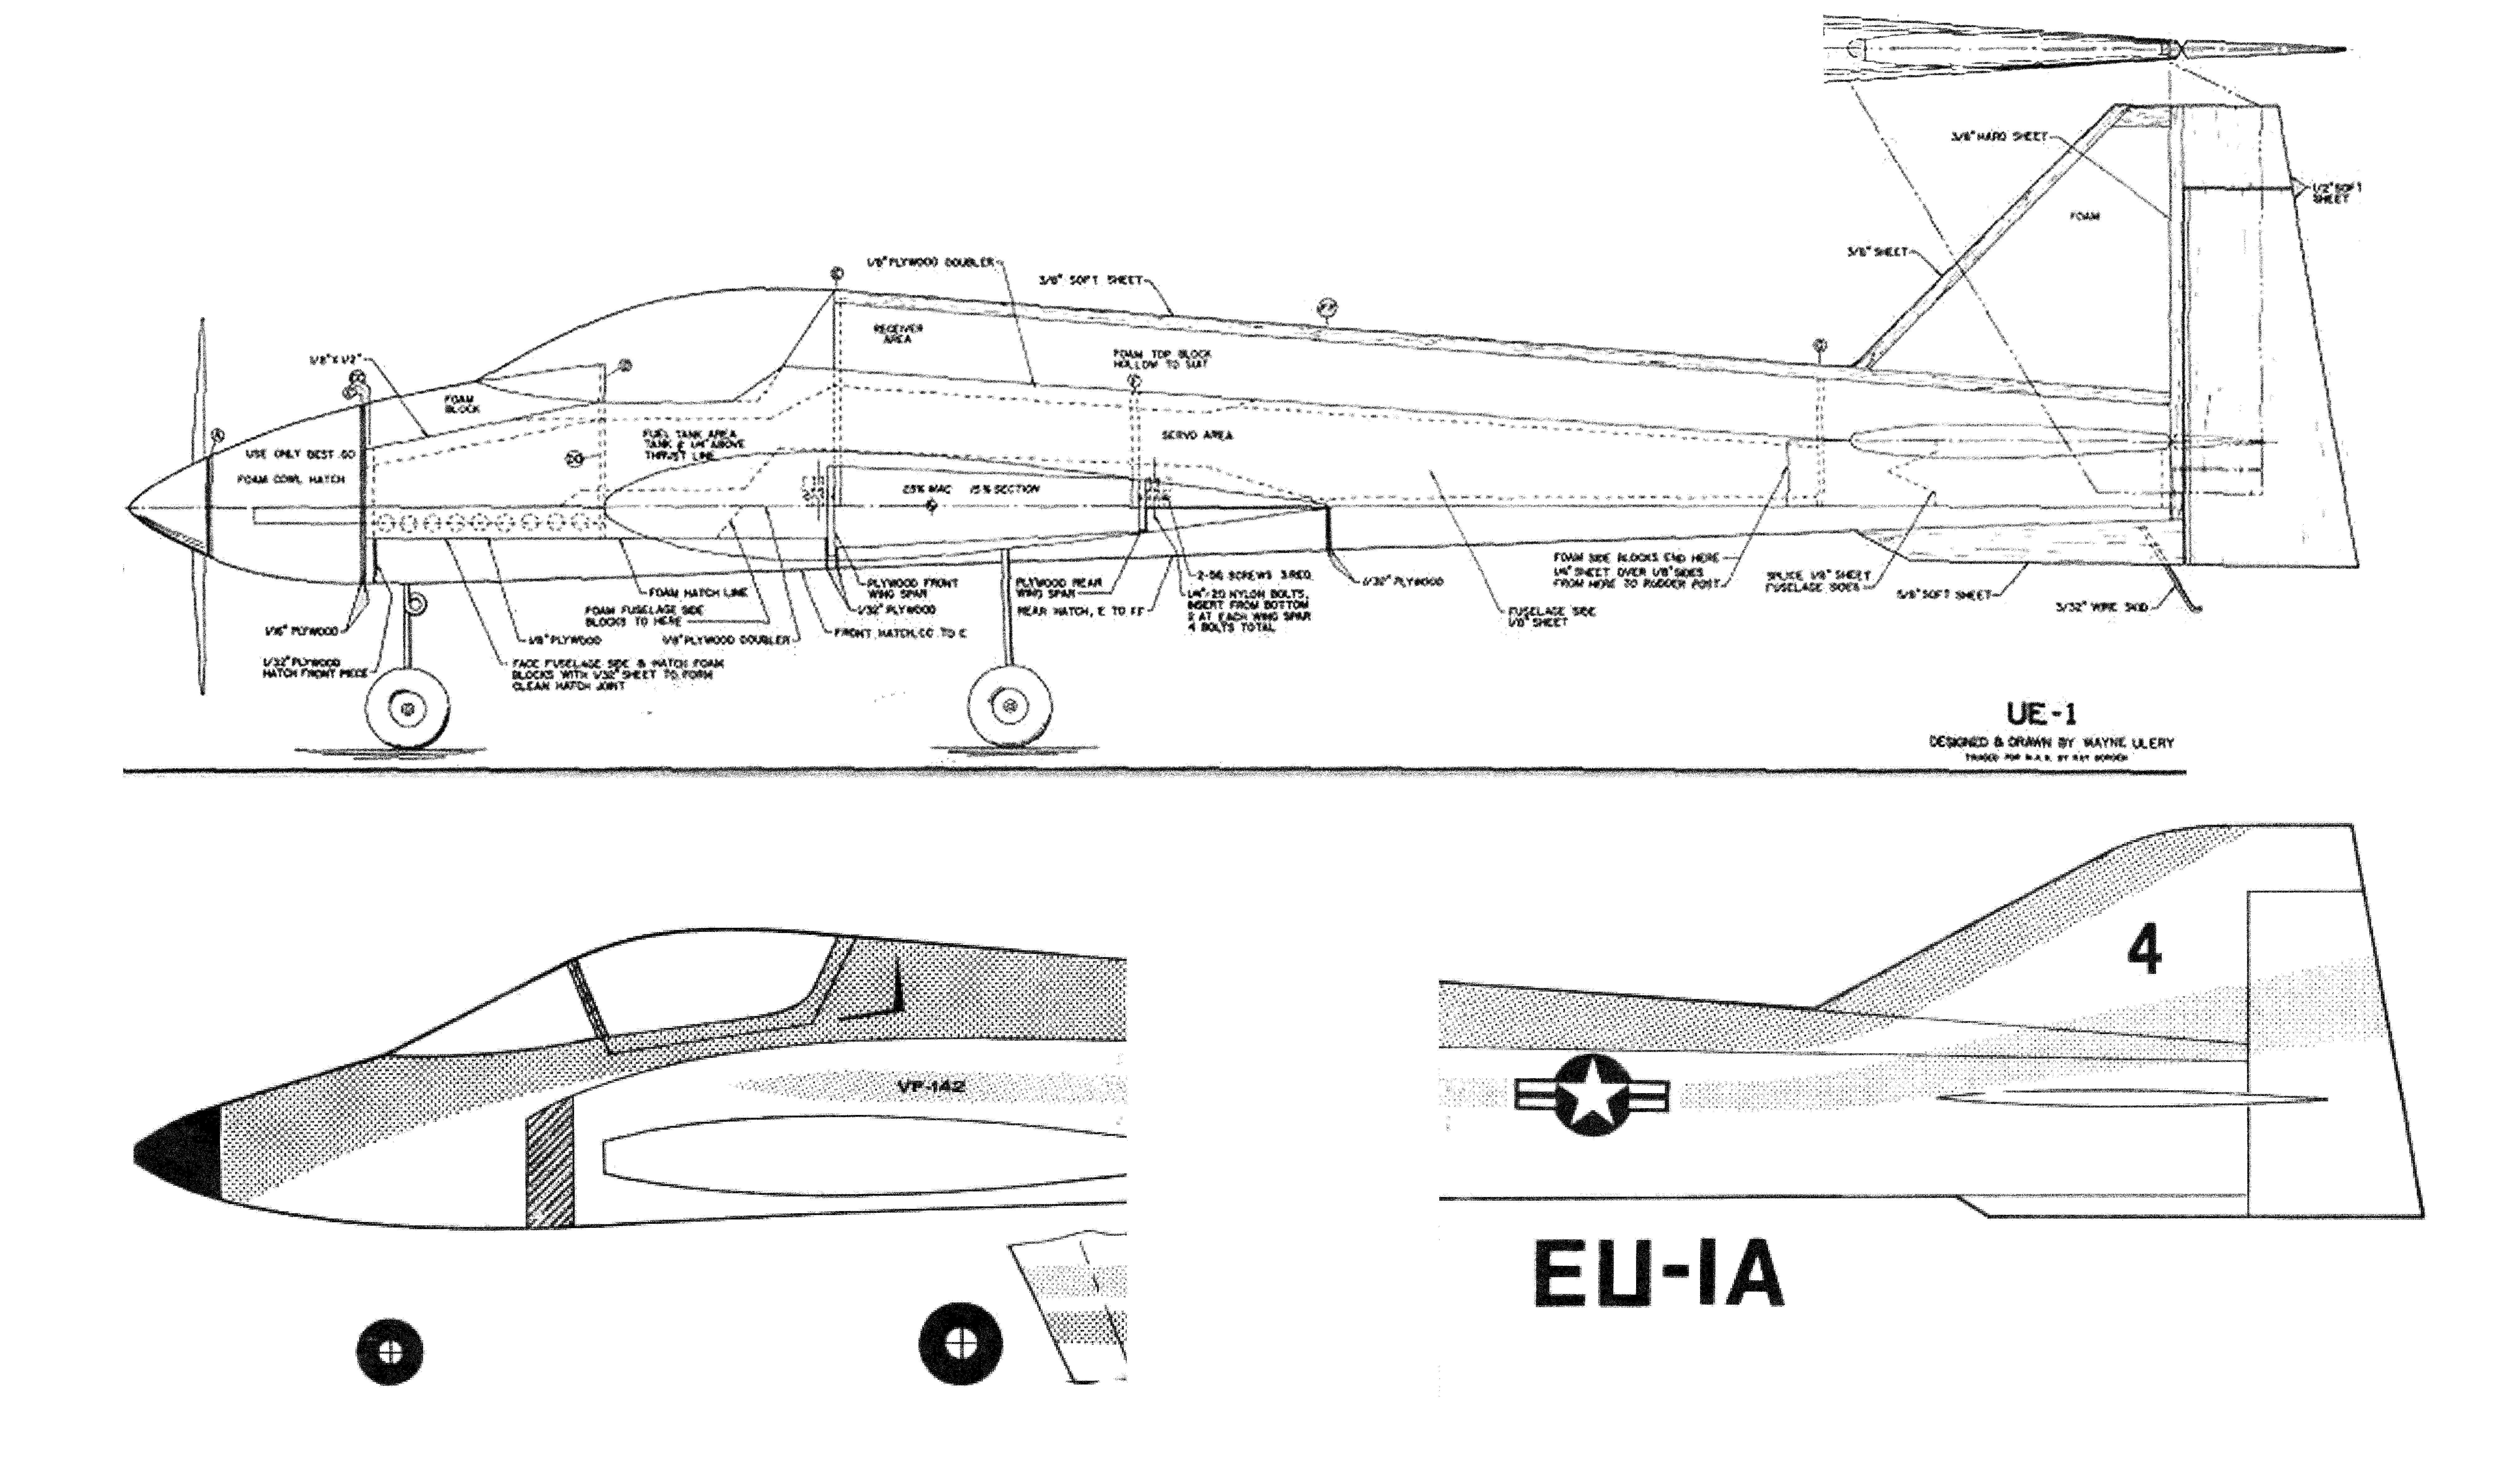 Click image for larger version  Name:EU-1 vs EU-1A b.jpg Views:213 Size:2.86 MB ID:2208299